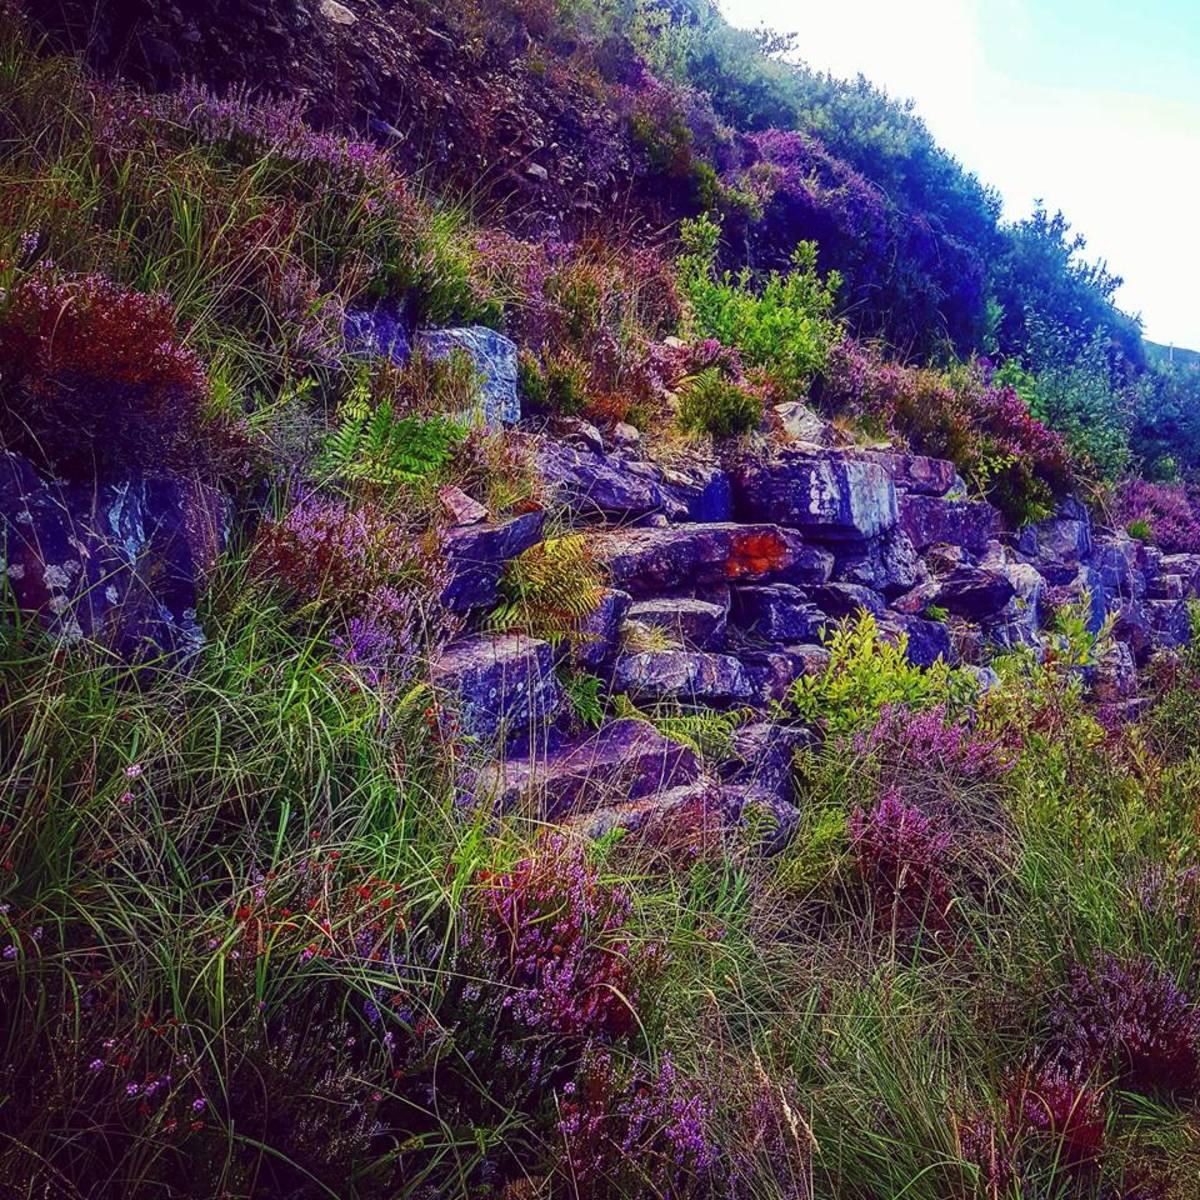 Purple heather grows in abundance along the cliffs of Ireland.